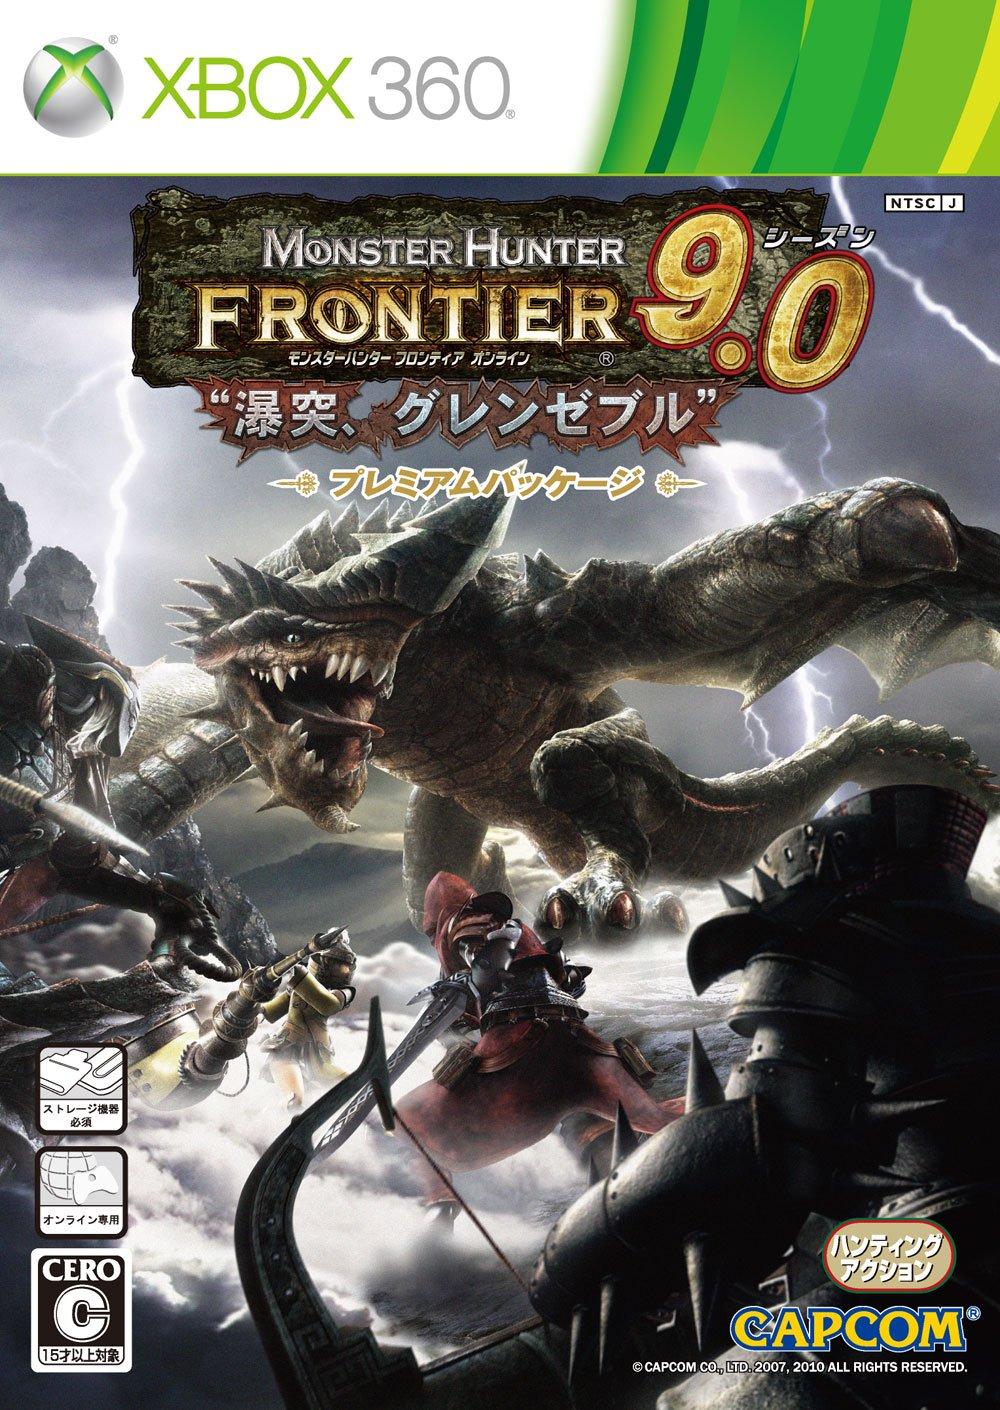 Usedgame xbox360 monster hunter frontier online season 9. 0 premium.